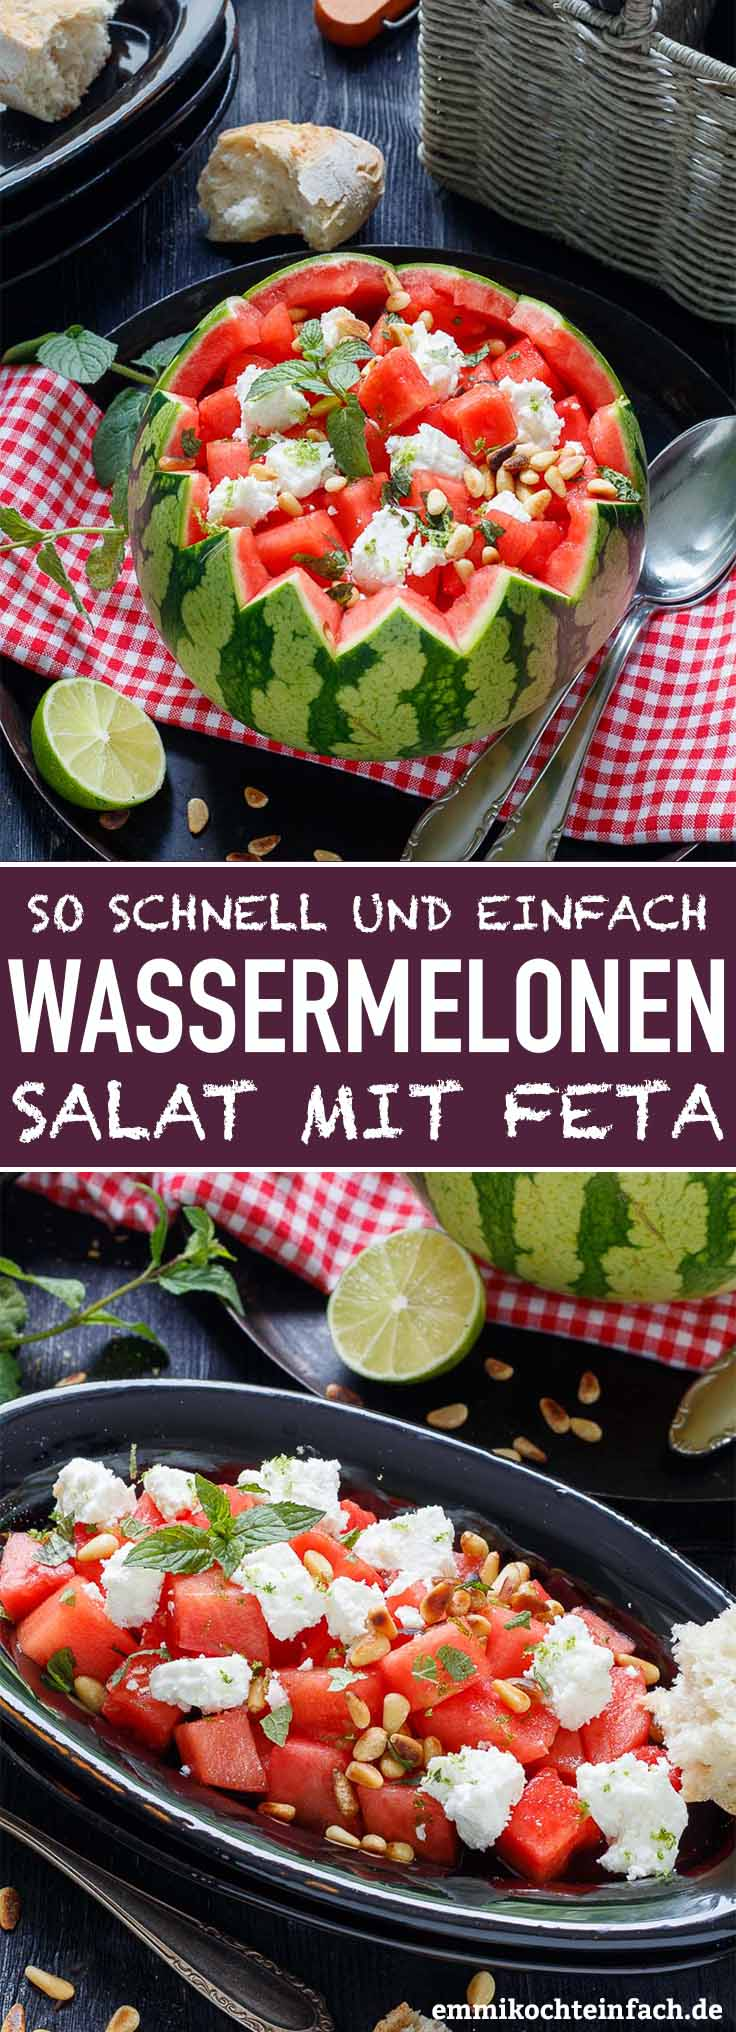 Einfacher Wassermelonen Salat mit Feta - www.emmikochteinfach.de